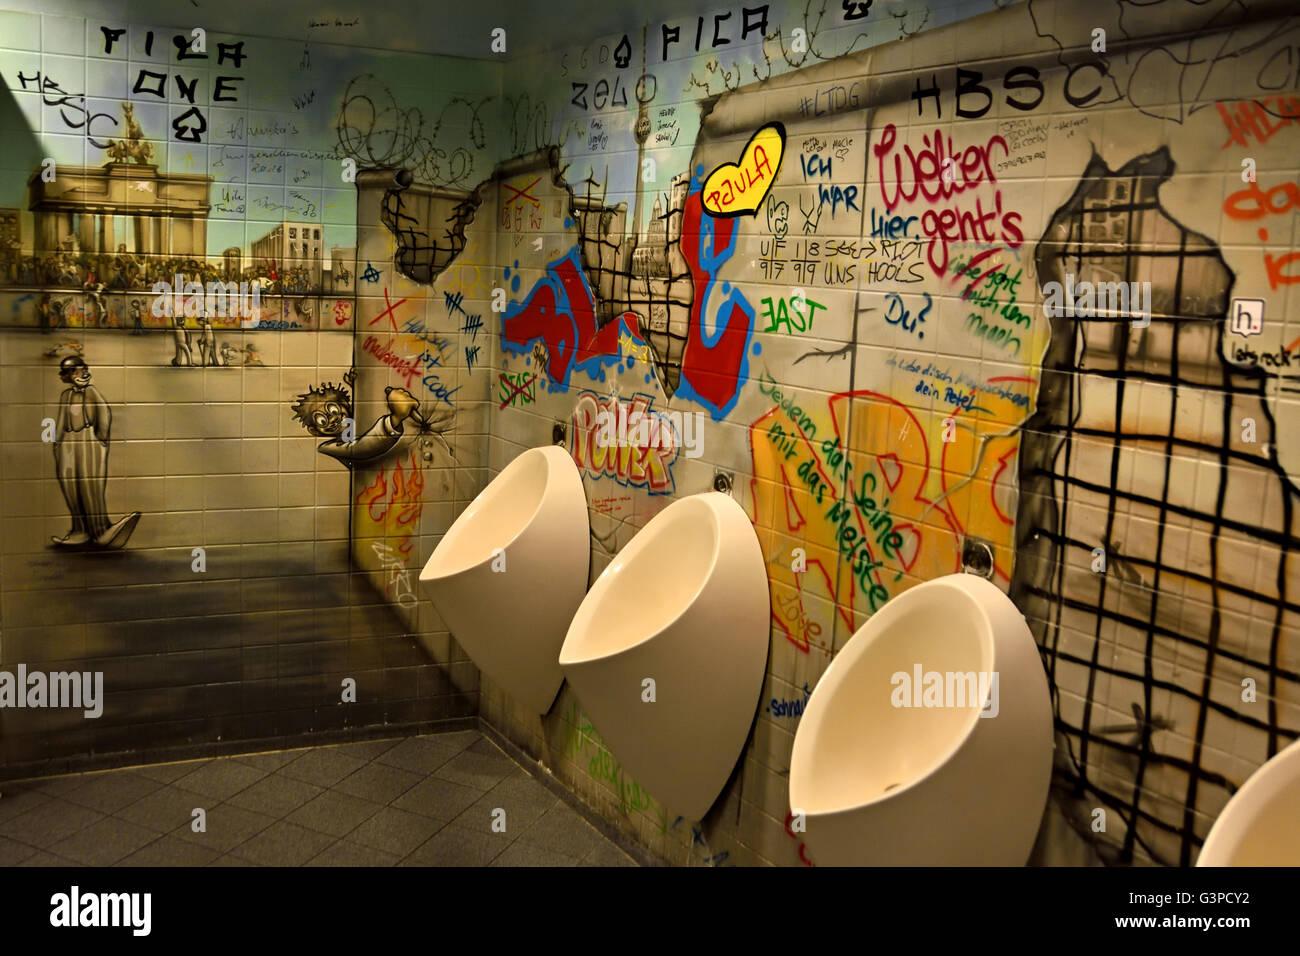 Grafitti wall painting - Graffiti Wall Painting Urinoir Urinal Toilet Berlin Germany